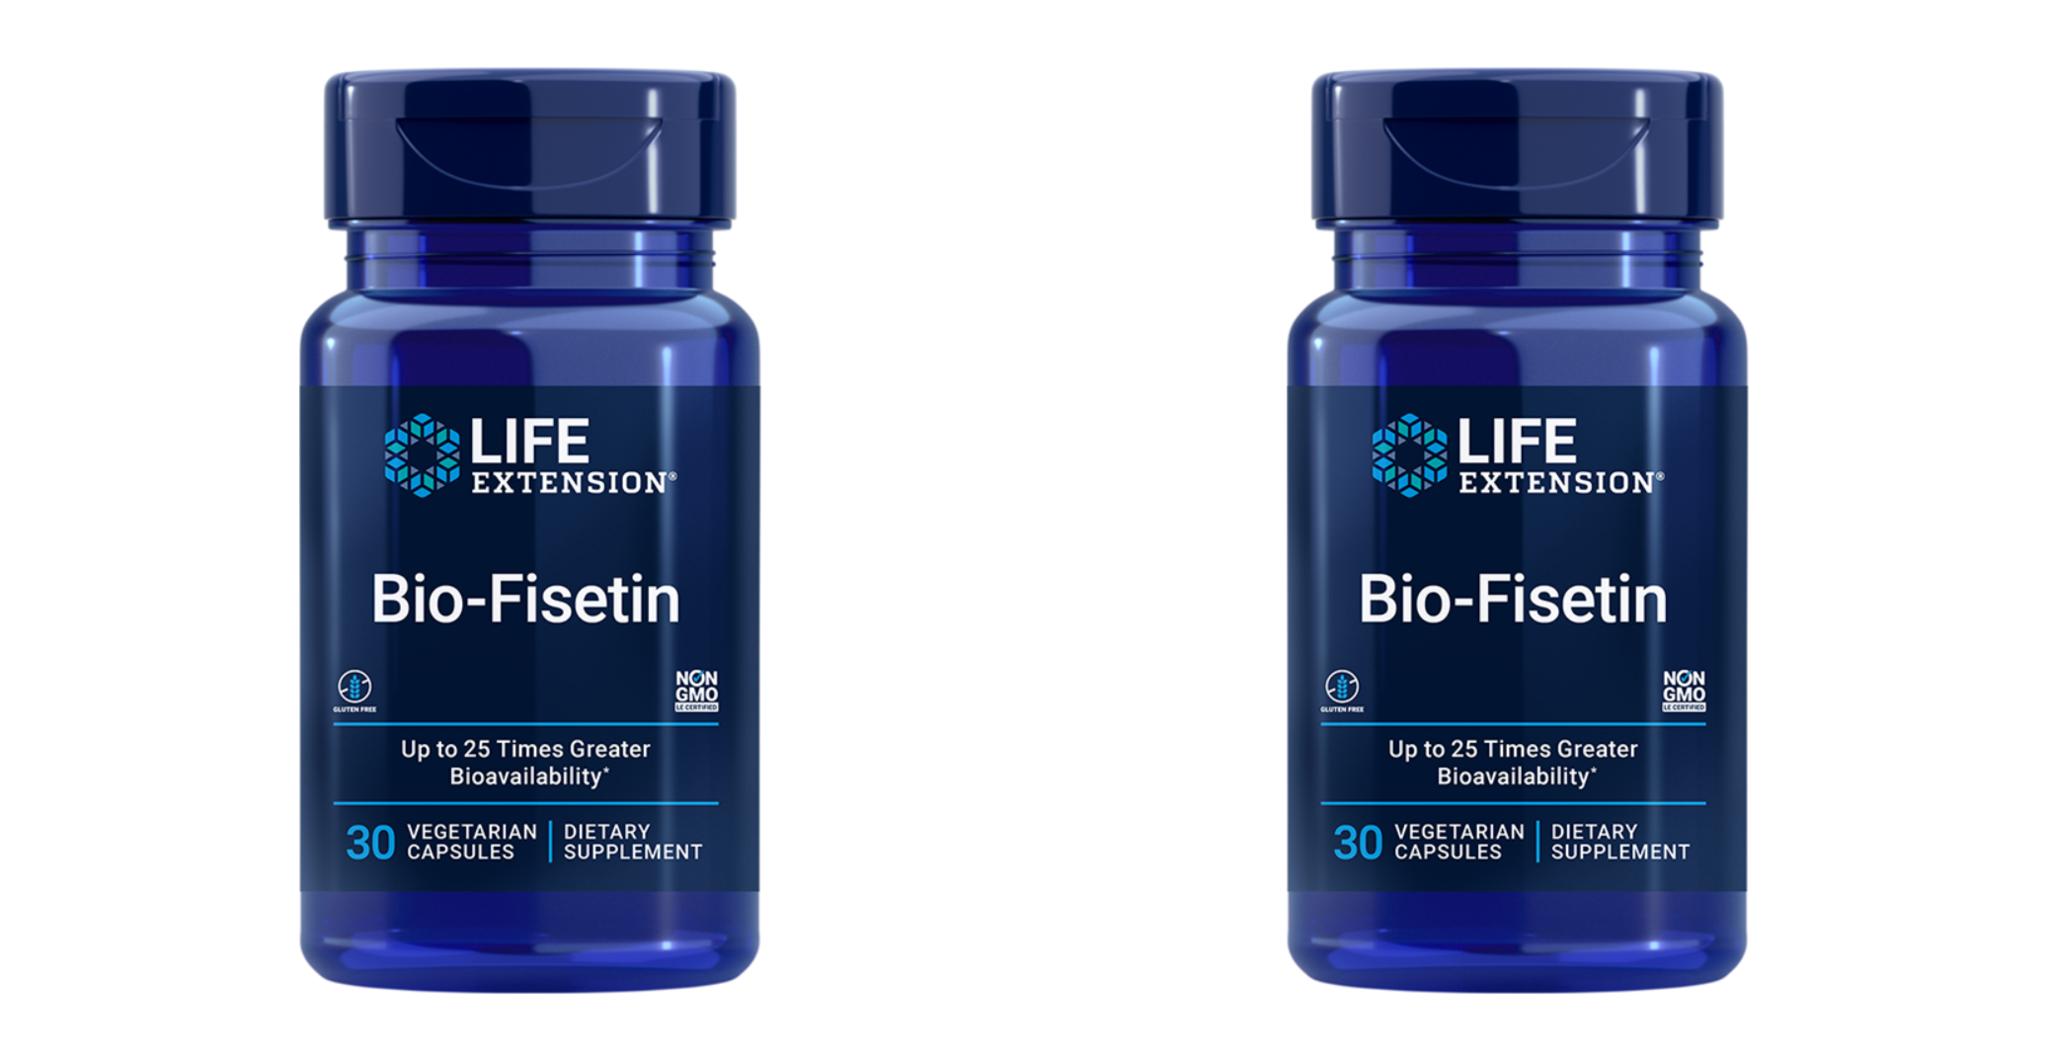 Life Extension Bio-Fisetin, 30 Vegetarian Capsules, 2-packs